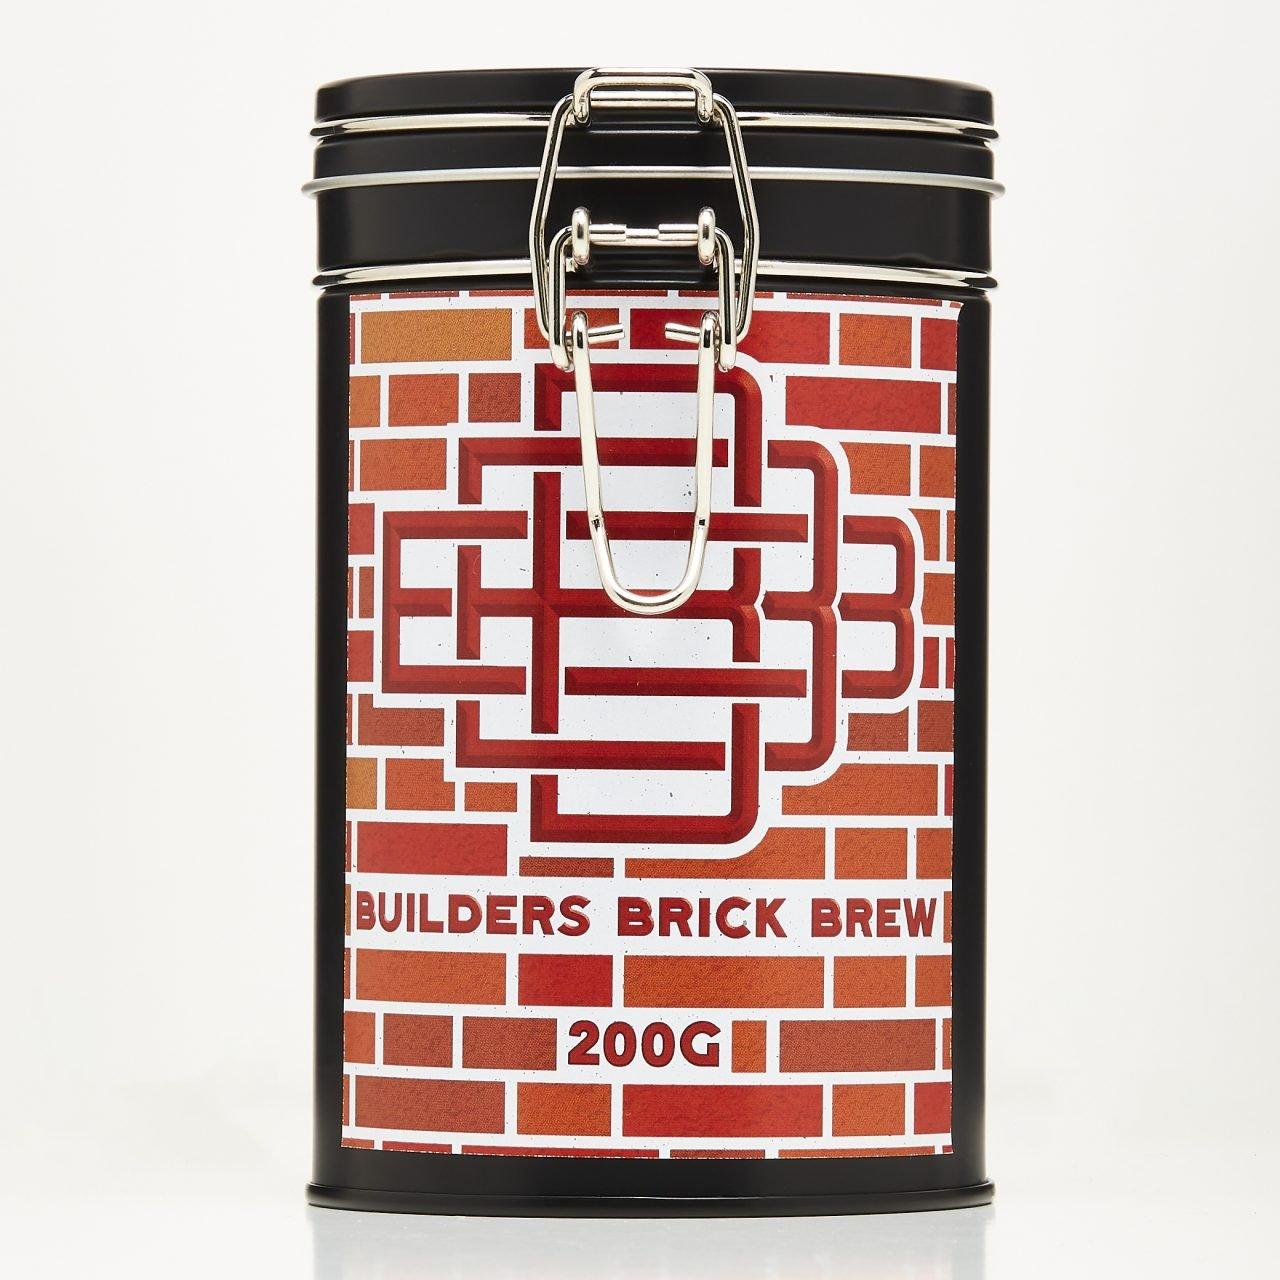 Builders Brick Brew – 200g Tin